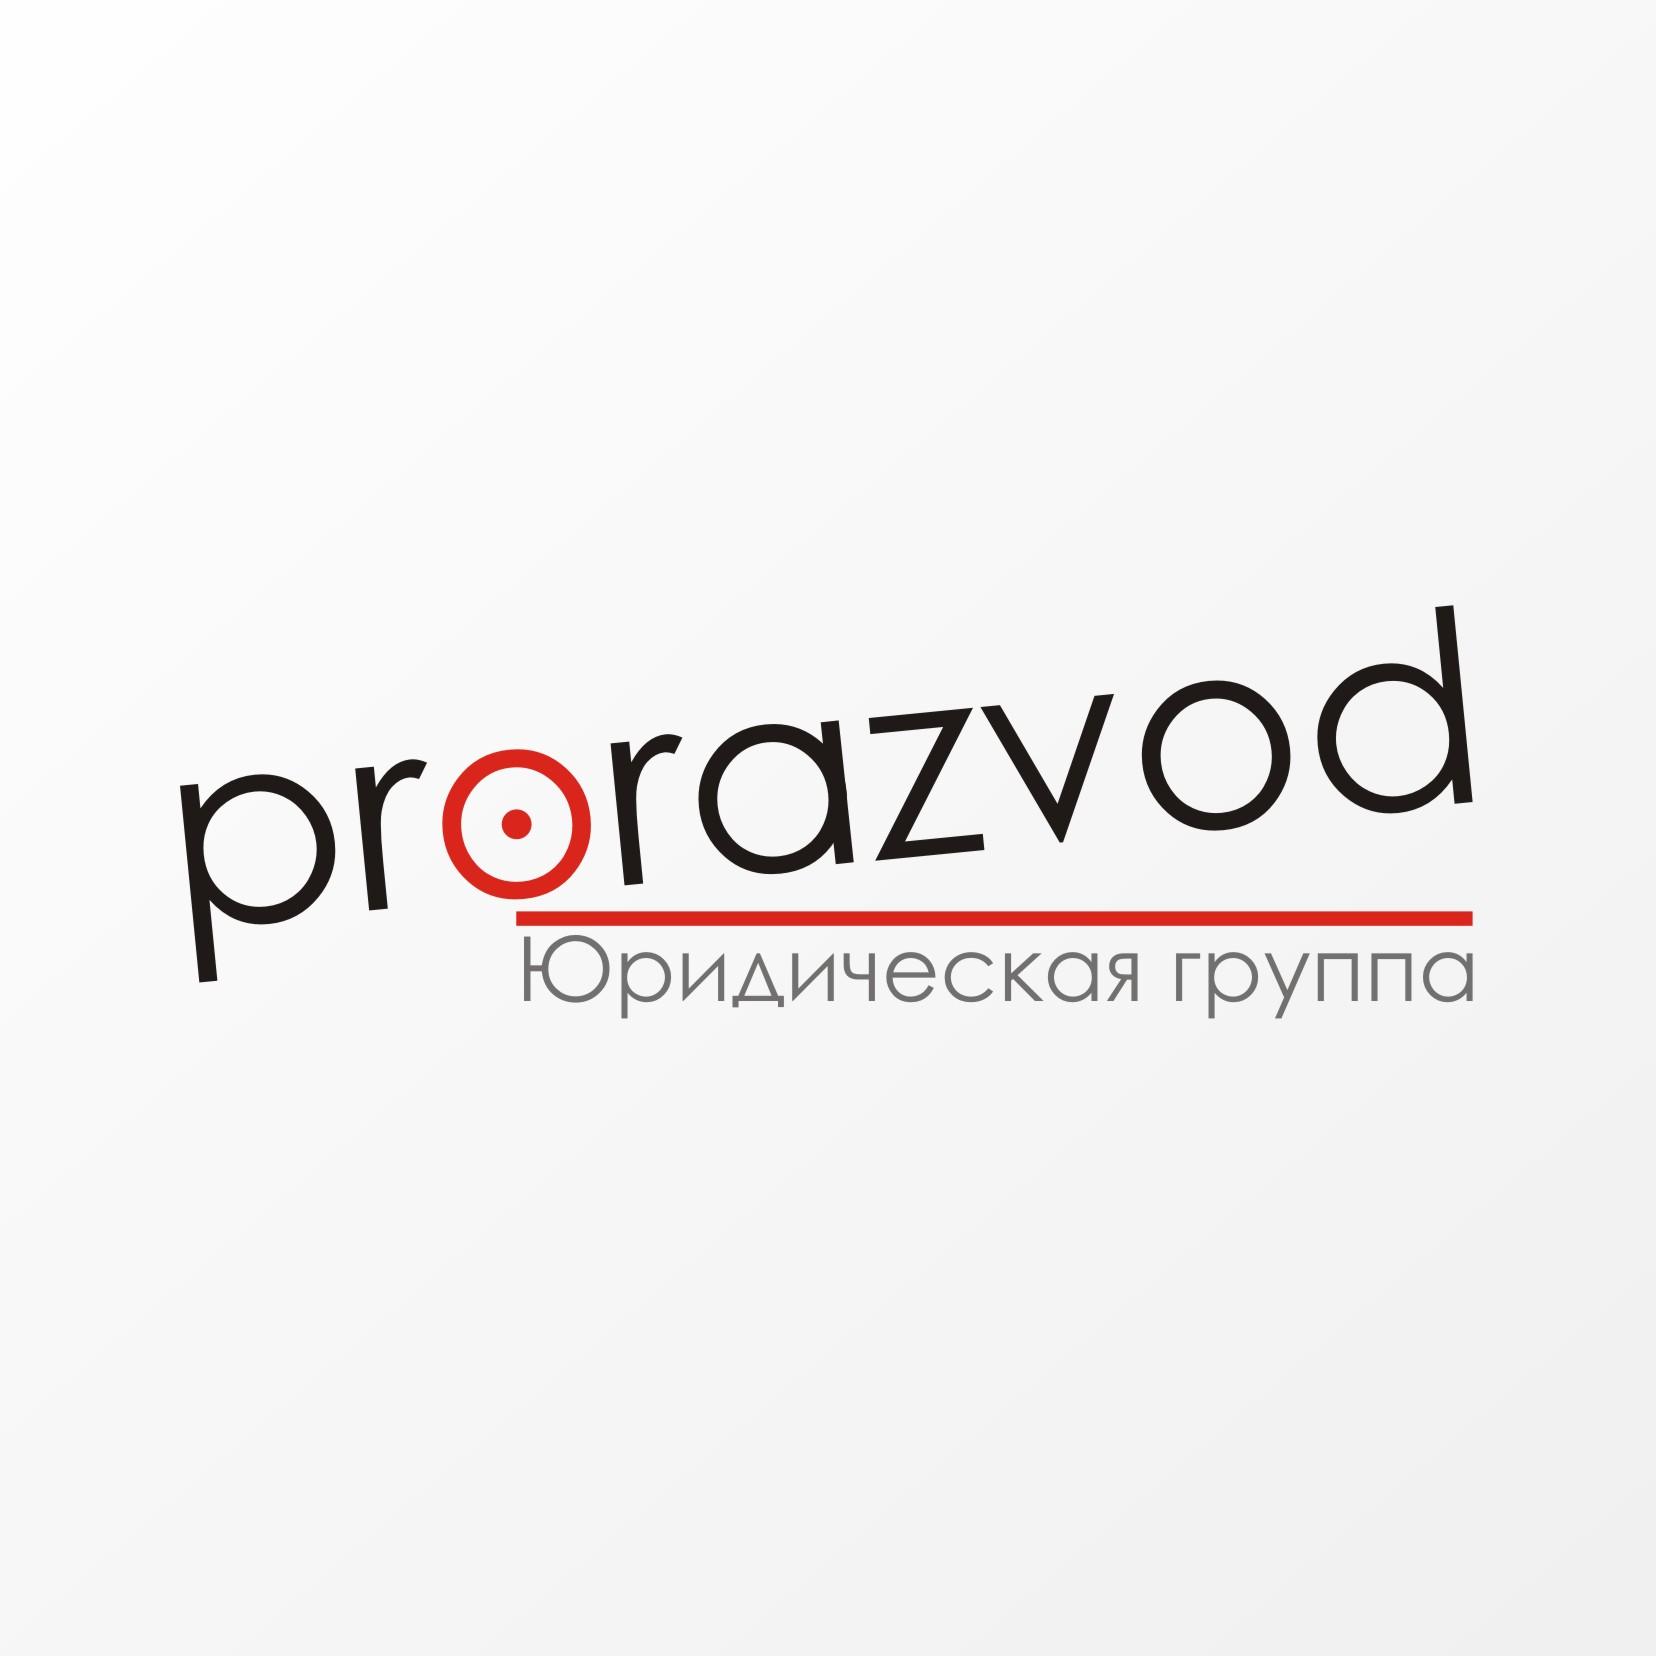 Логотип и фирм стиль для бракоразводного агенства. фото f_18858769767dddda.jpg